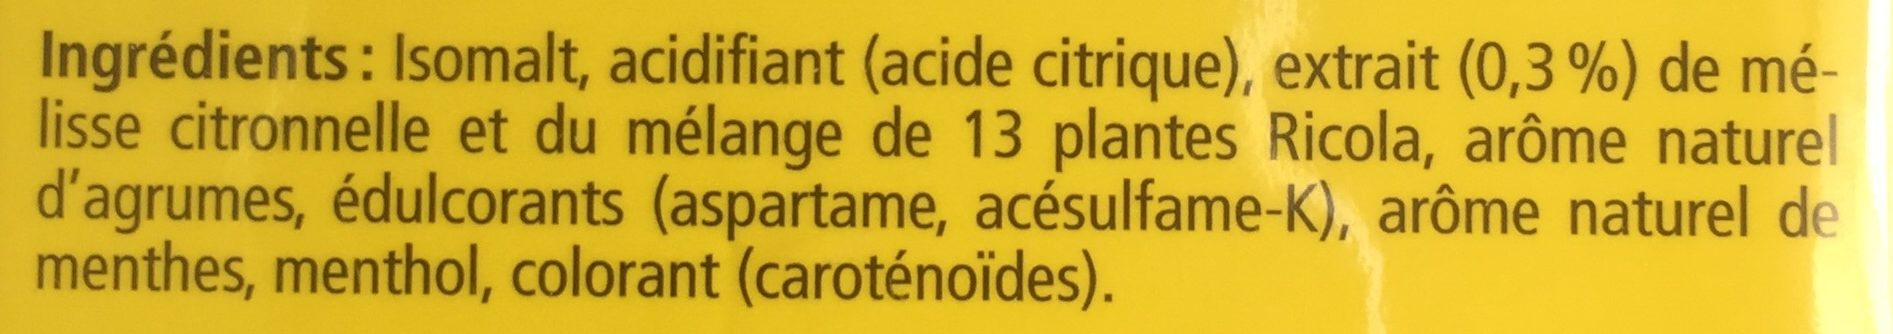 Ricola citron melisse - Ingrediënten - fr